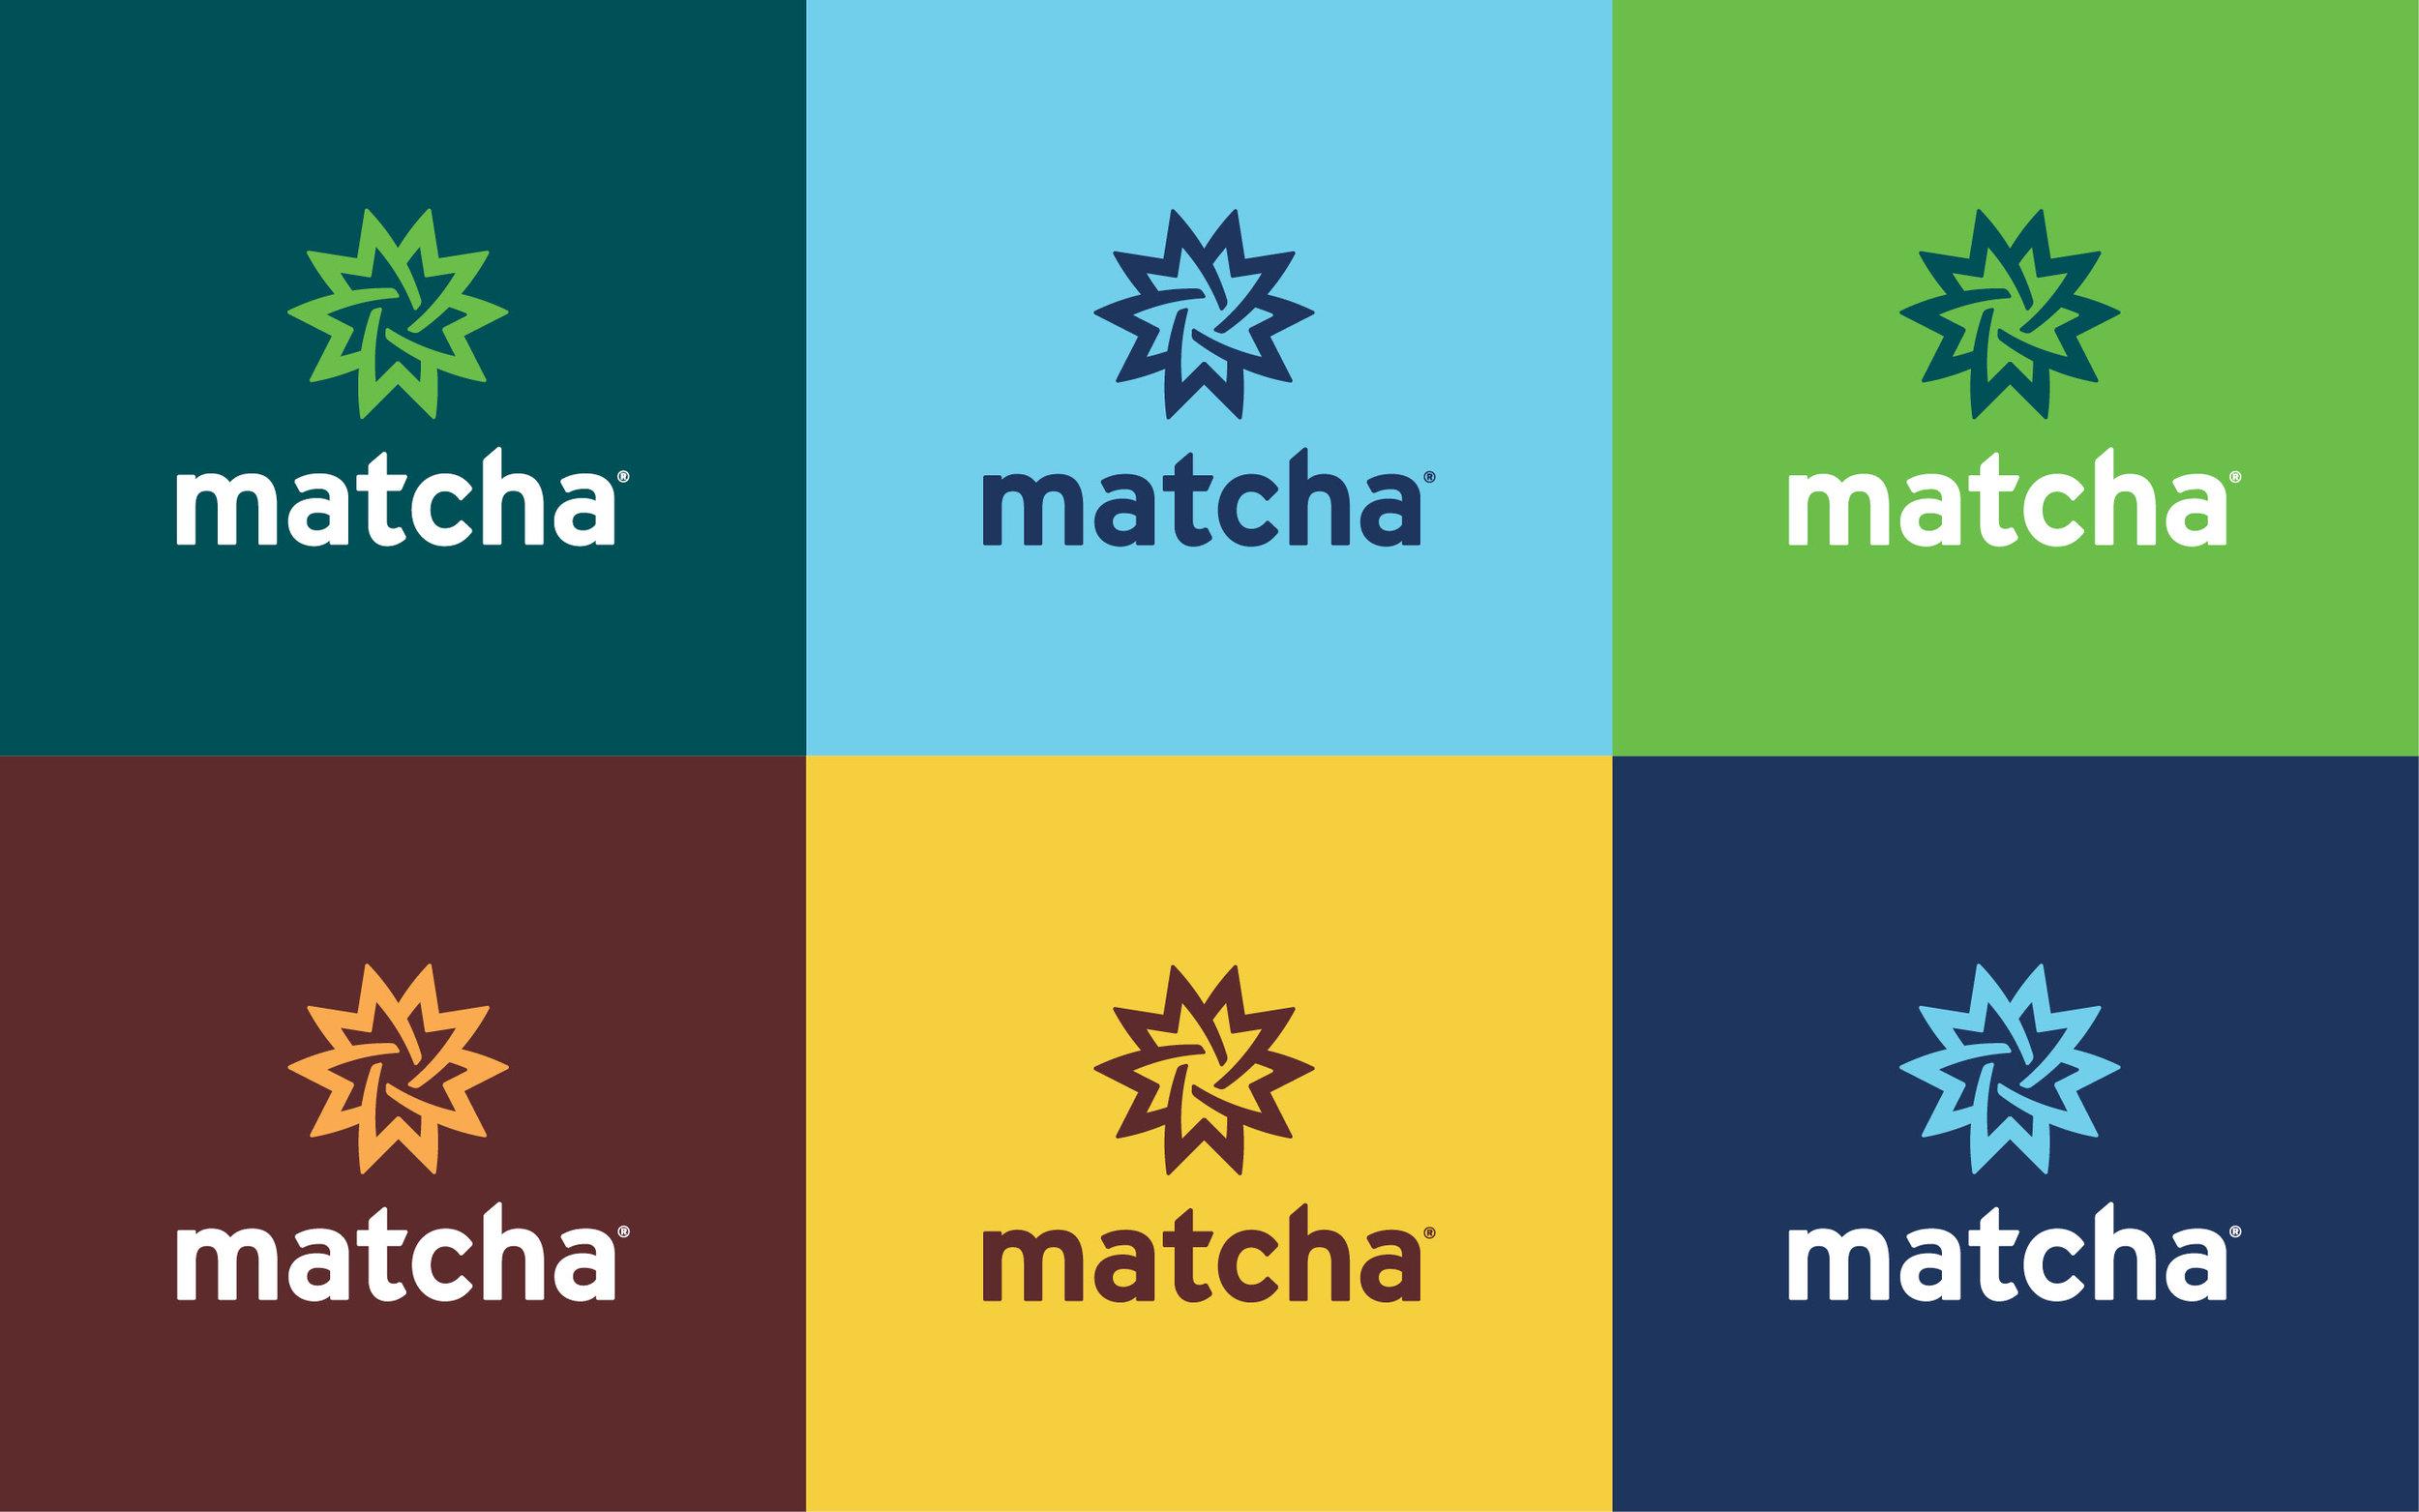 Matcha_Image5.jpg